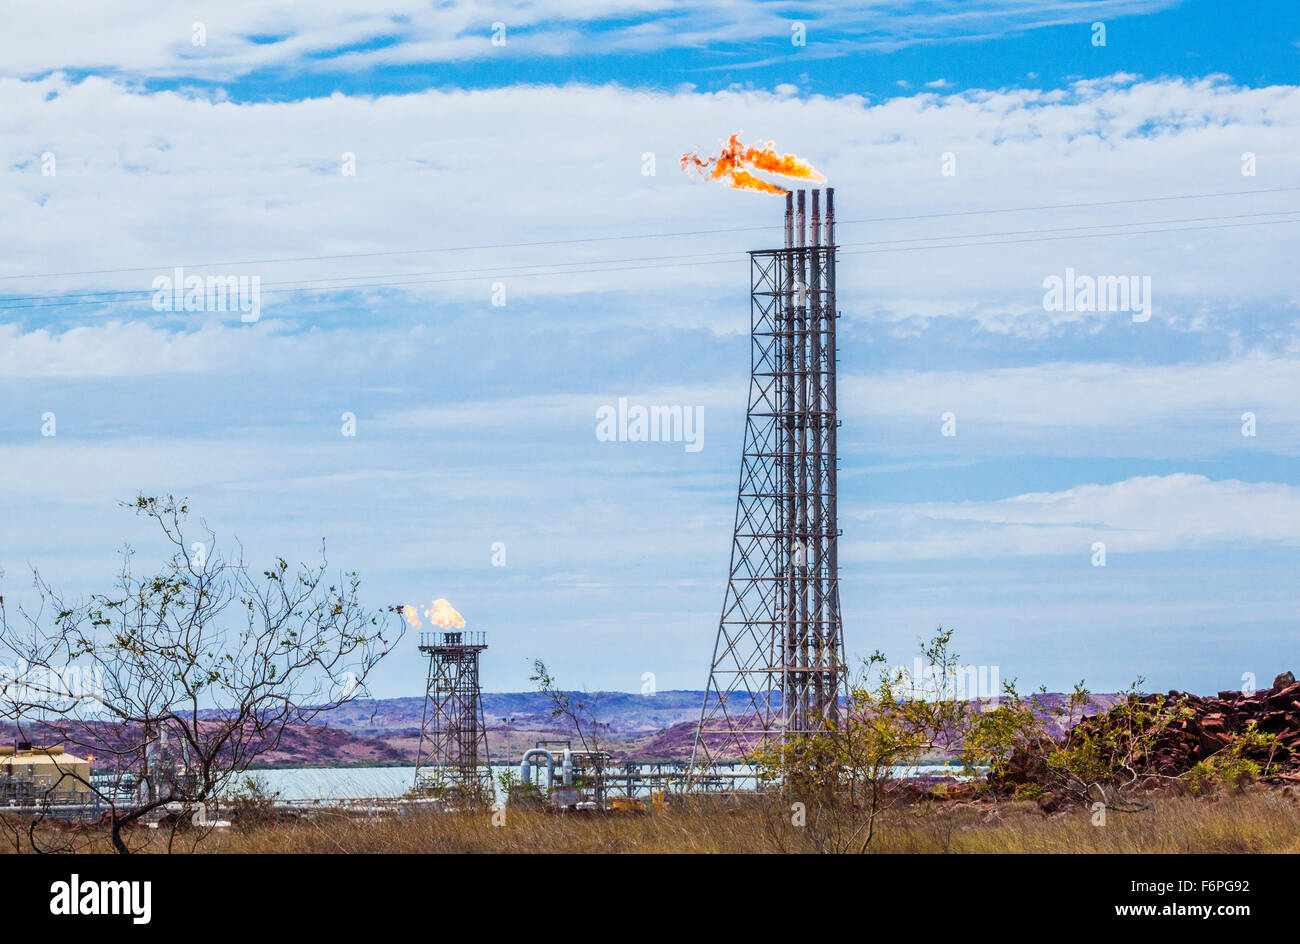 Australia, Western Australia, Pilbara, Karratha, gas flare stacks at Woodside gas processing plant on the Burrup - Stock Image